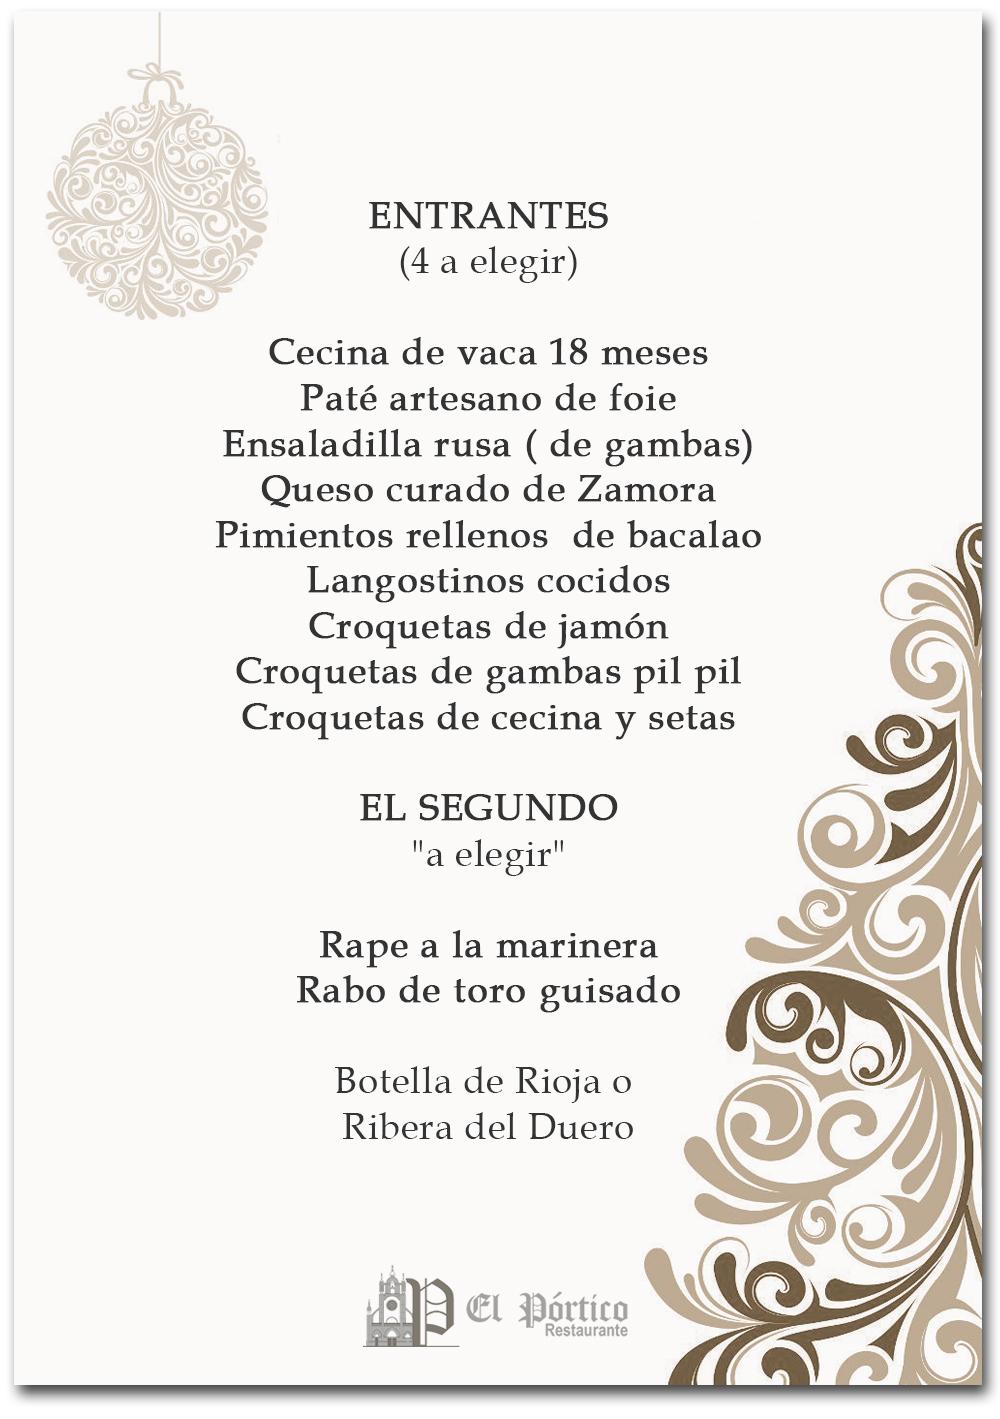 menu-navidad-01